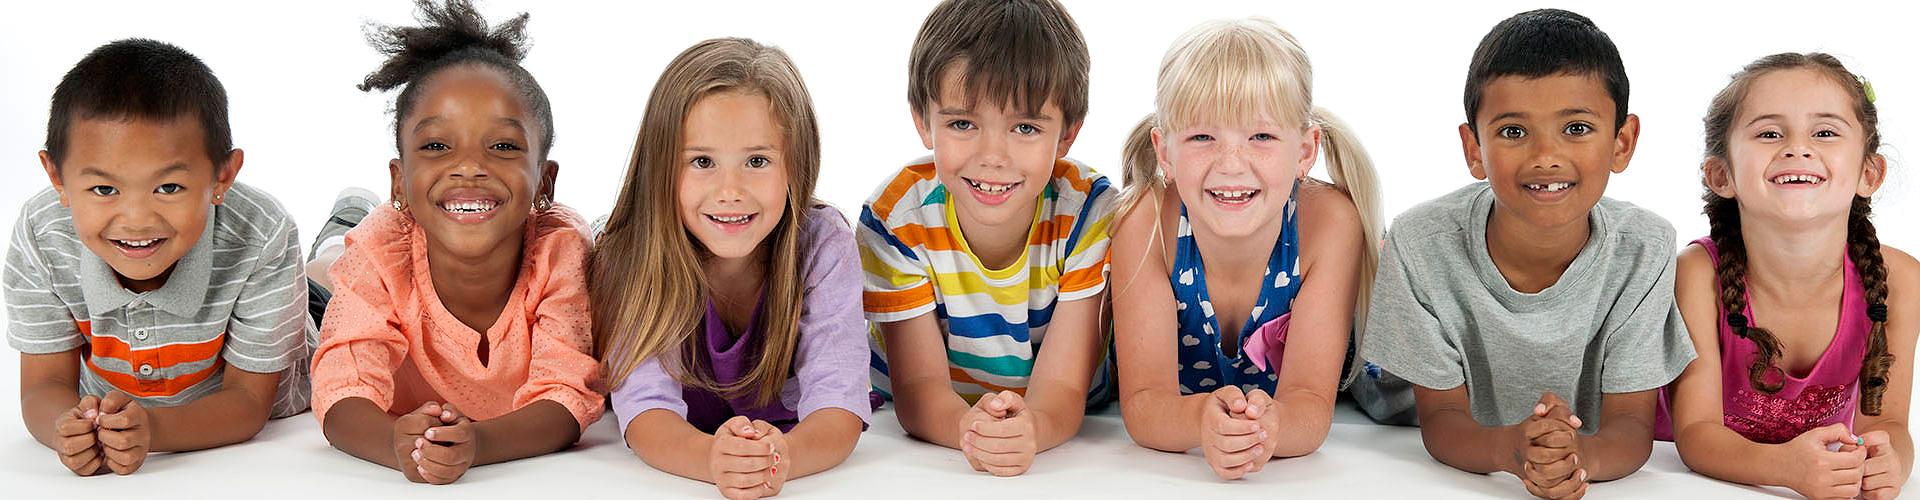 Central Florida Child Health Program Inc.